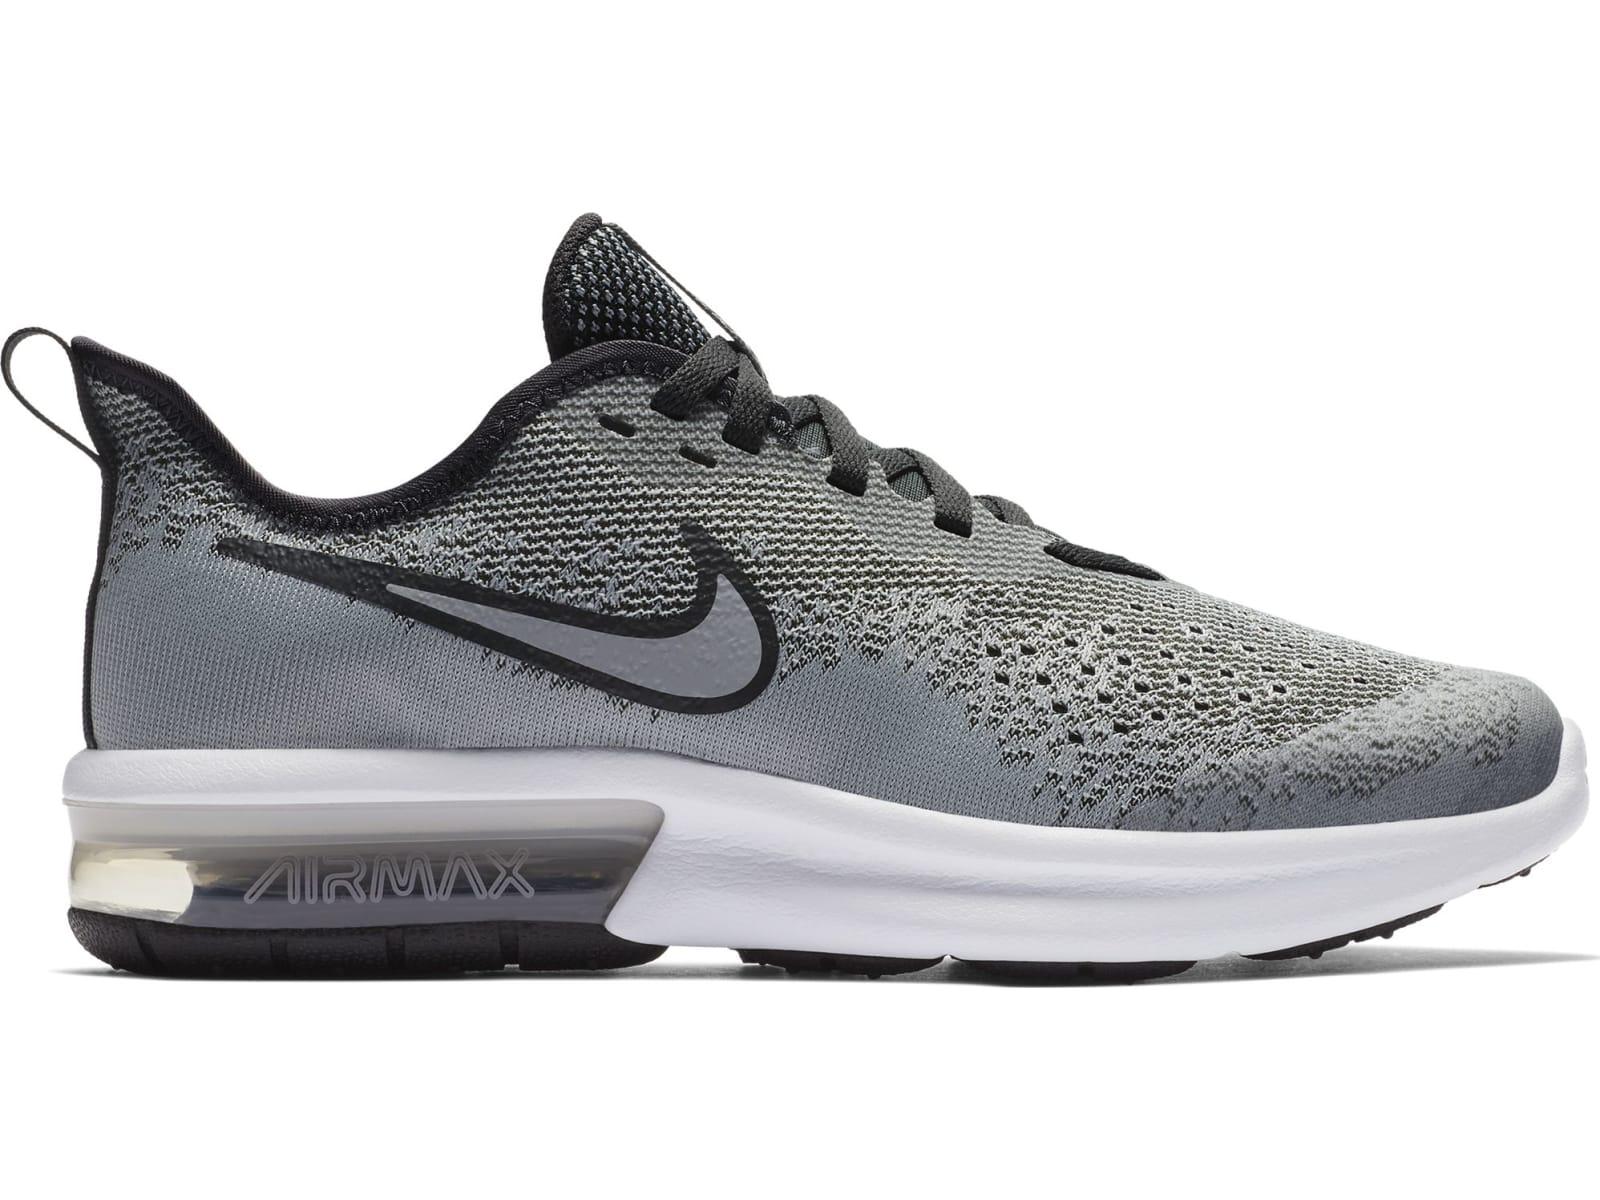 quality design 6ebd6 3bd42 Se detaljer. Nike